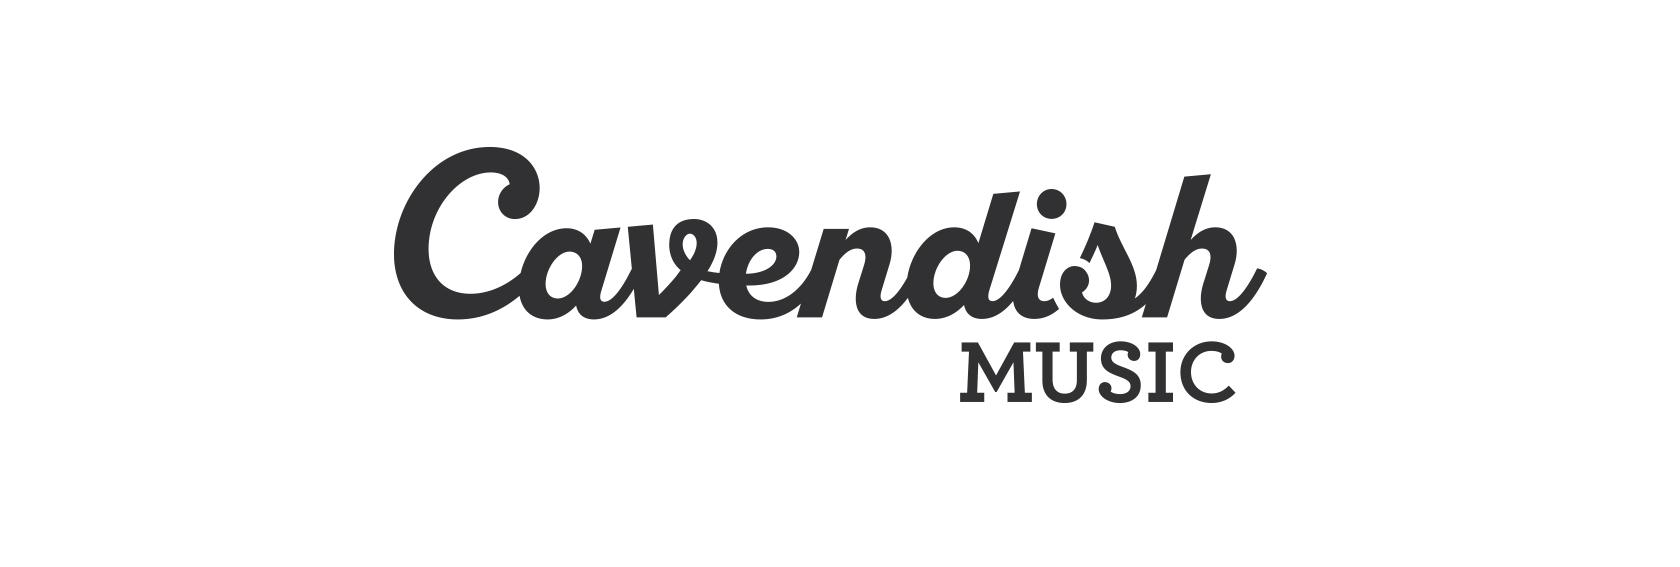 Cavendish_identity_2.jpg